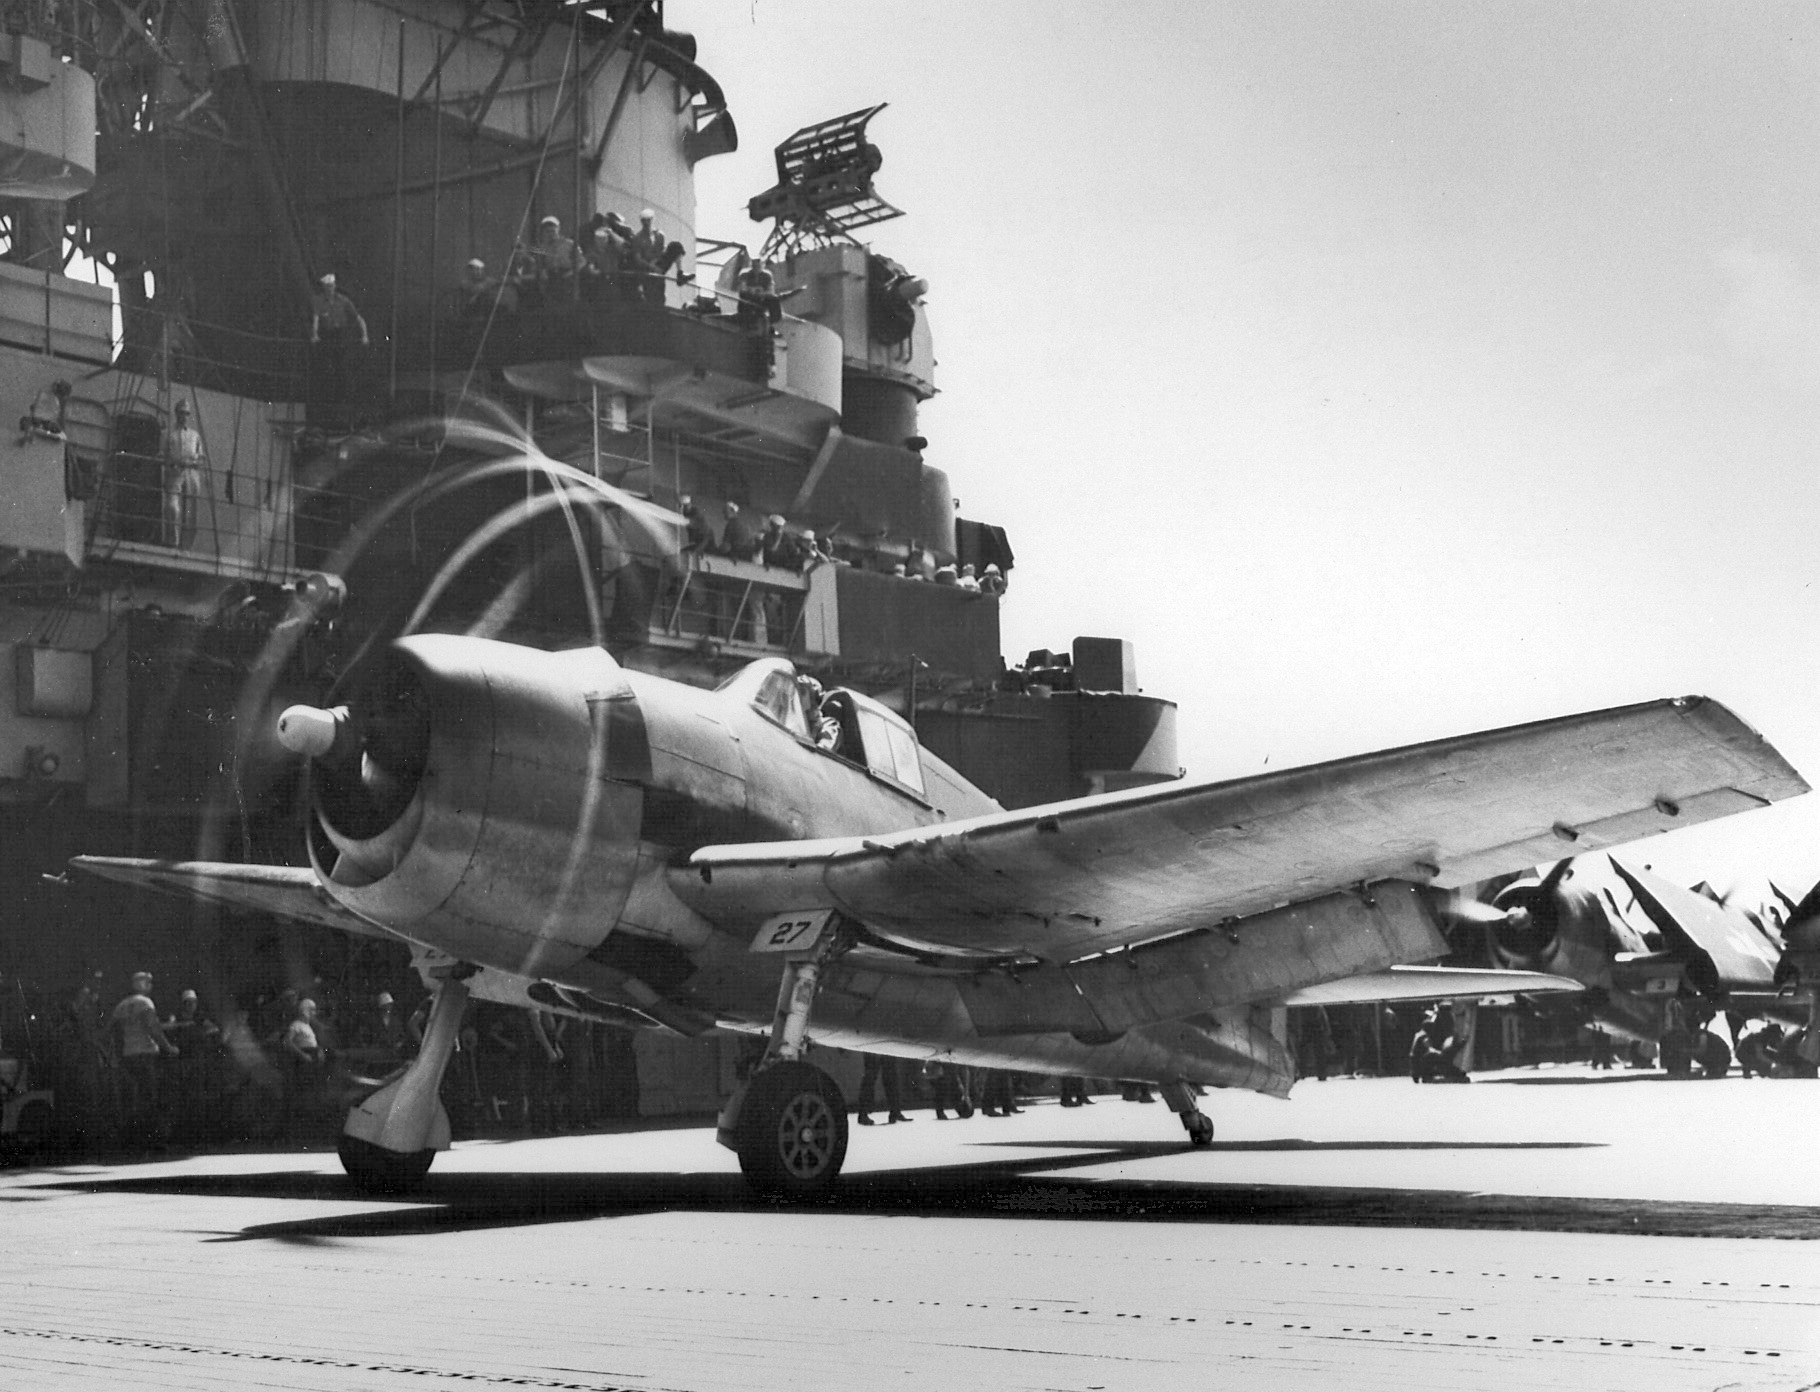 Grumman F6F 5 Hellcat VF 6 White 27 landing aboard CV 19 USS Hancock 1944 01